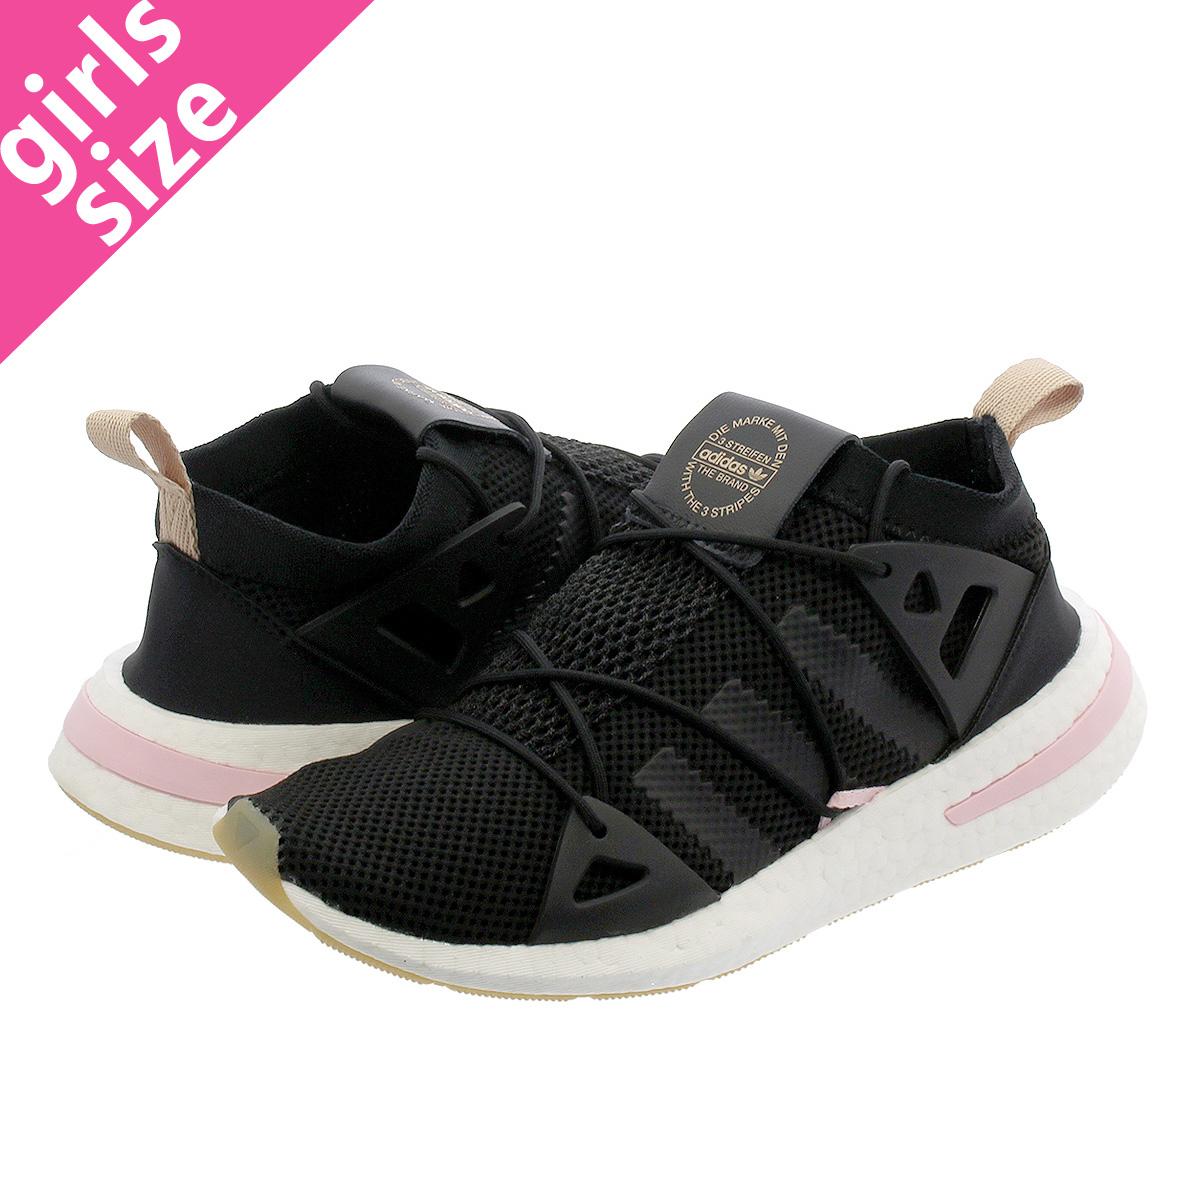 08d7620534a adidas ARKYN W Adidas Arkin women CORE BLACK CORE BLACK RUNNING WHITE bd7575